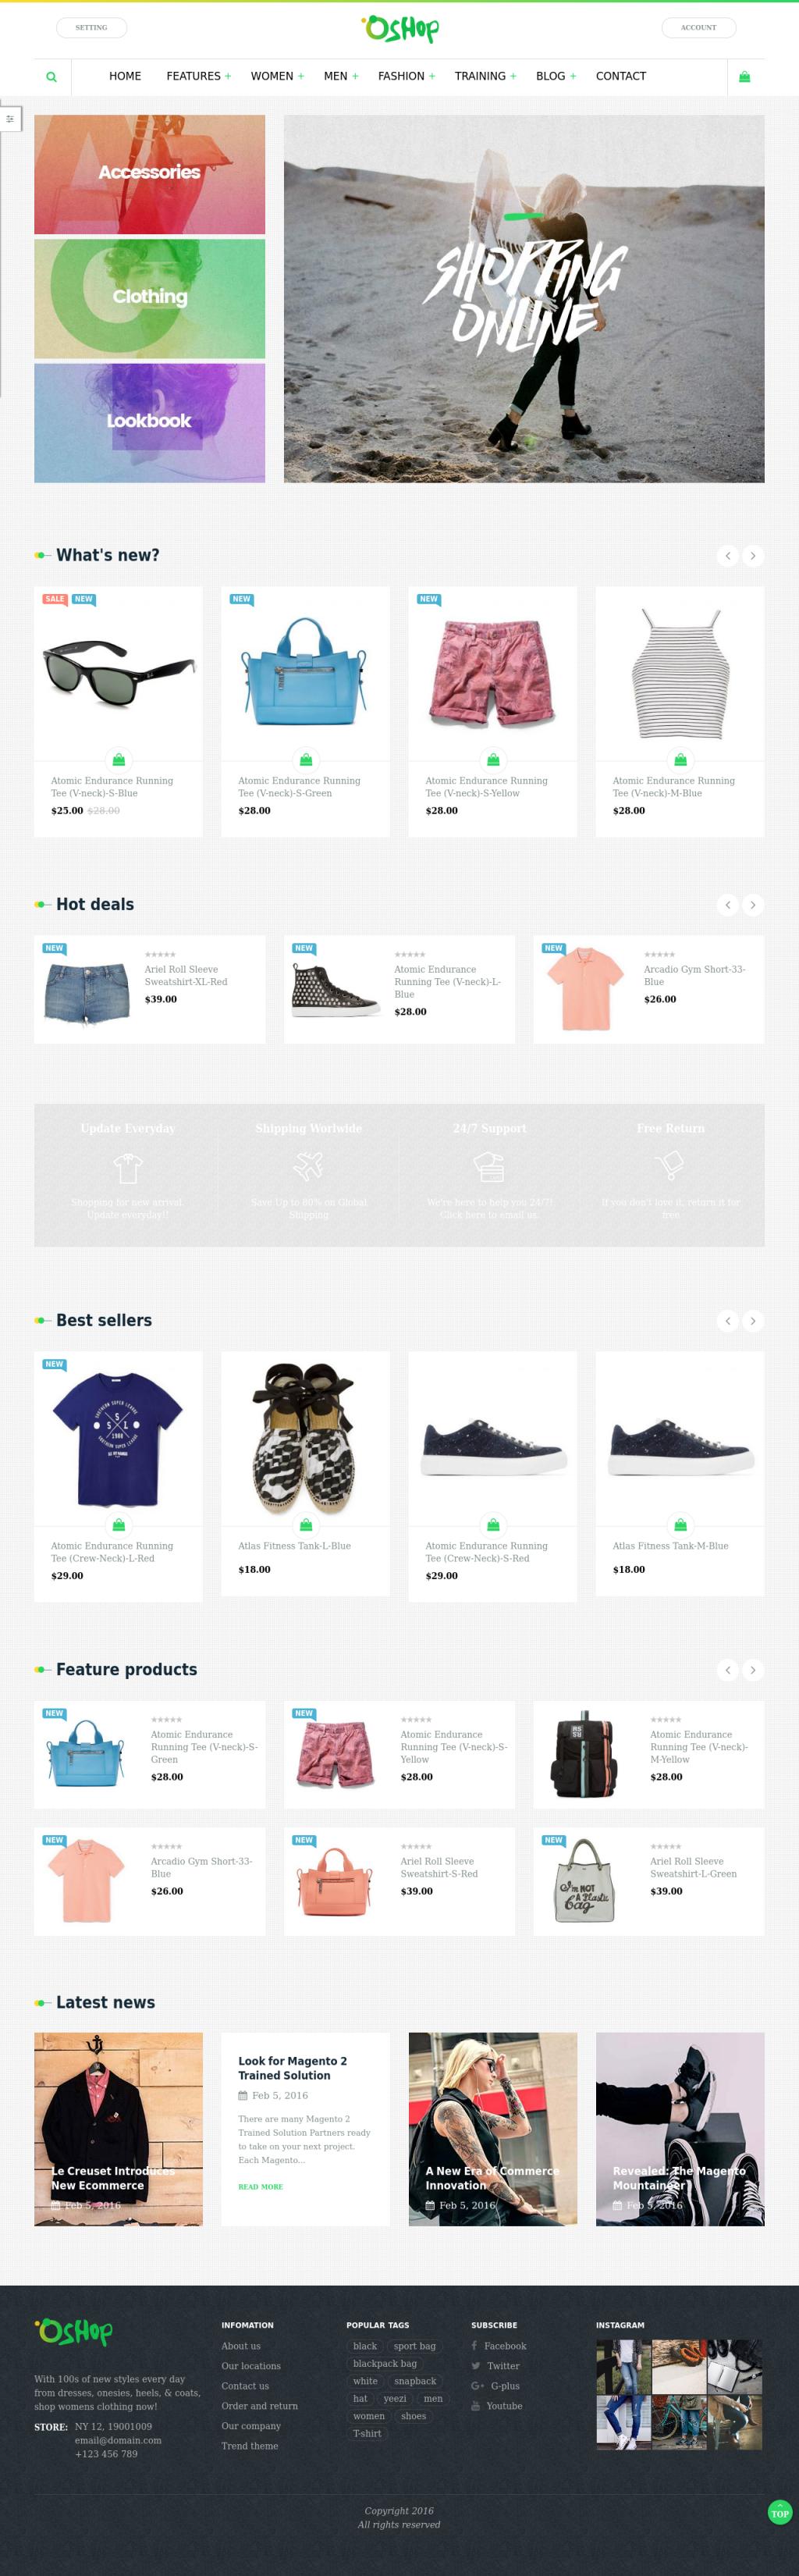 Magento 2 Bootstrap theme